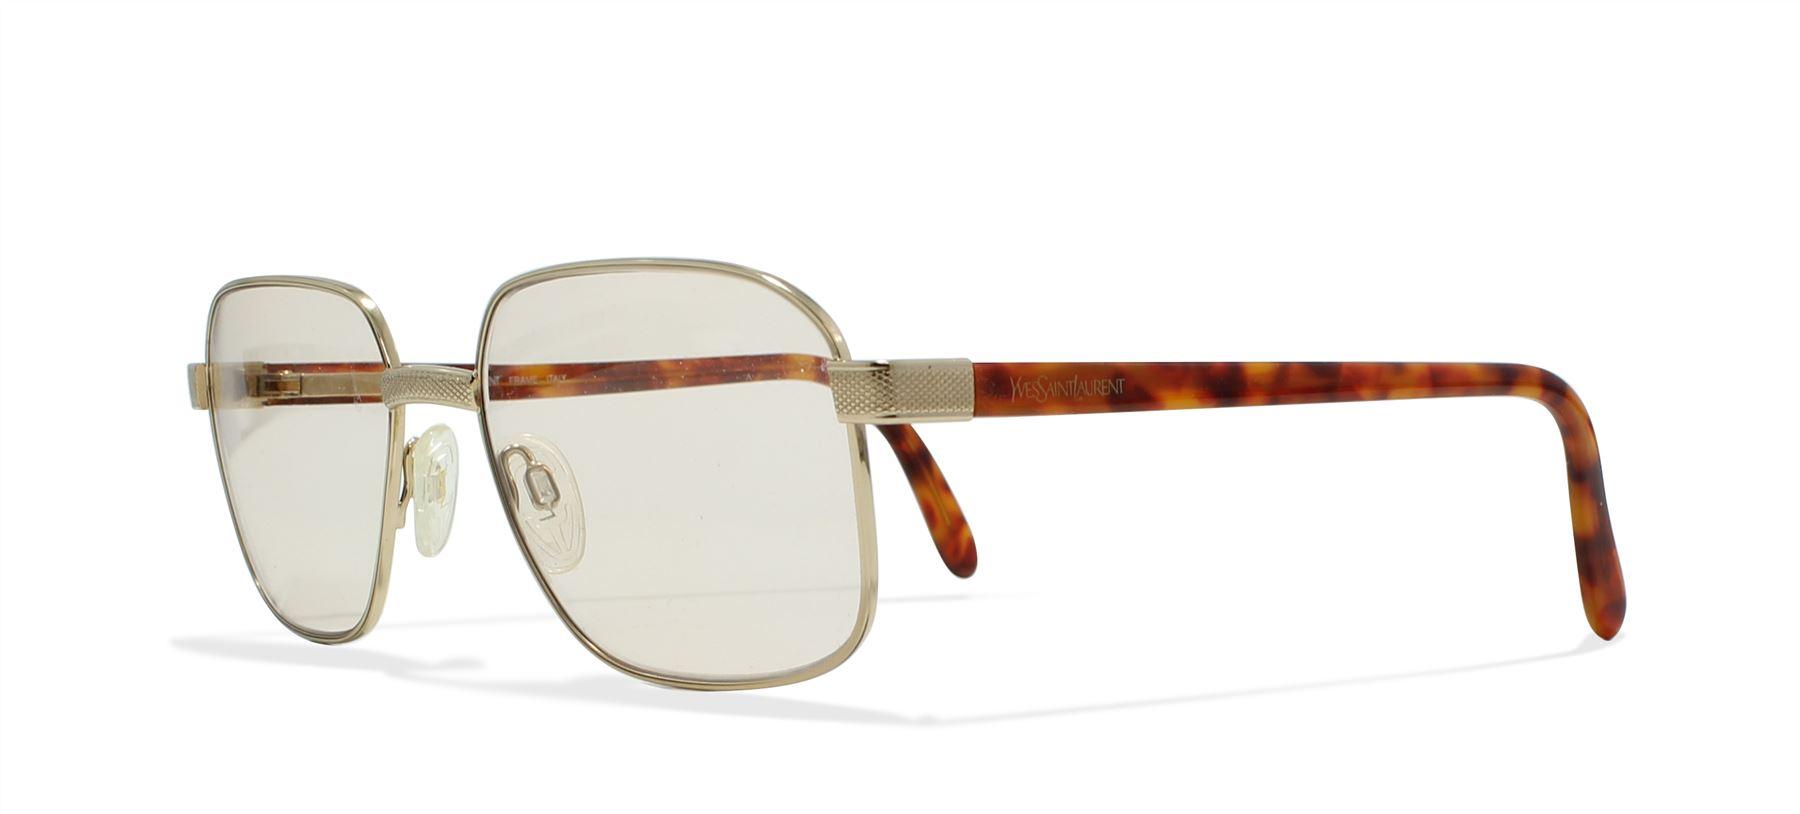 a28d6658a0 Details about Yves Saint Laurent 4032 Y101 Gold Vintage Sunglasses Square  For Men and Women